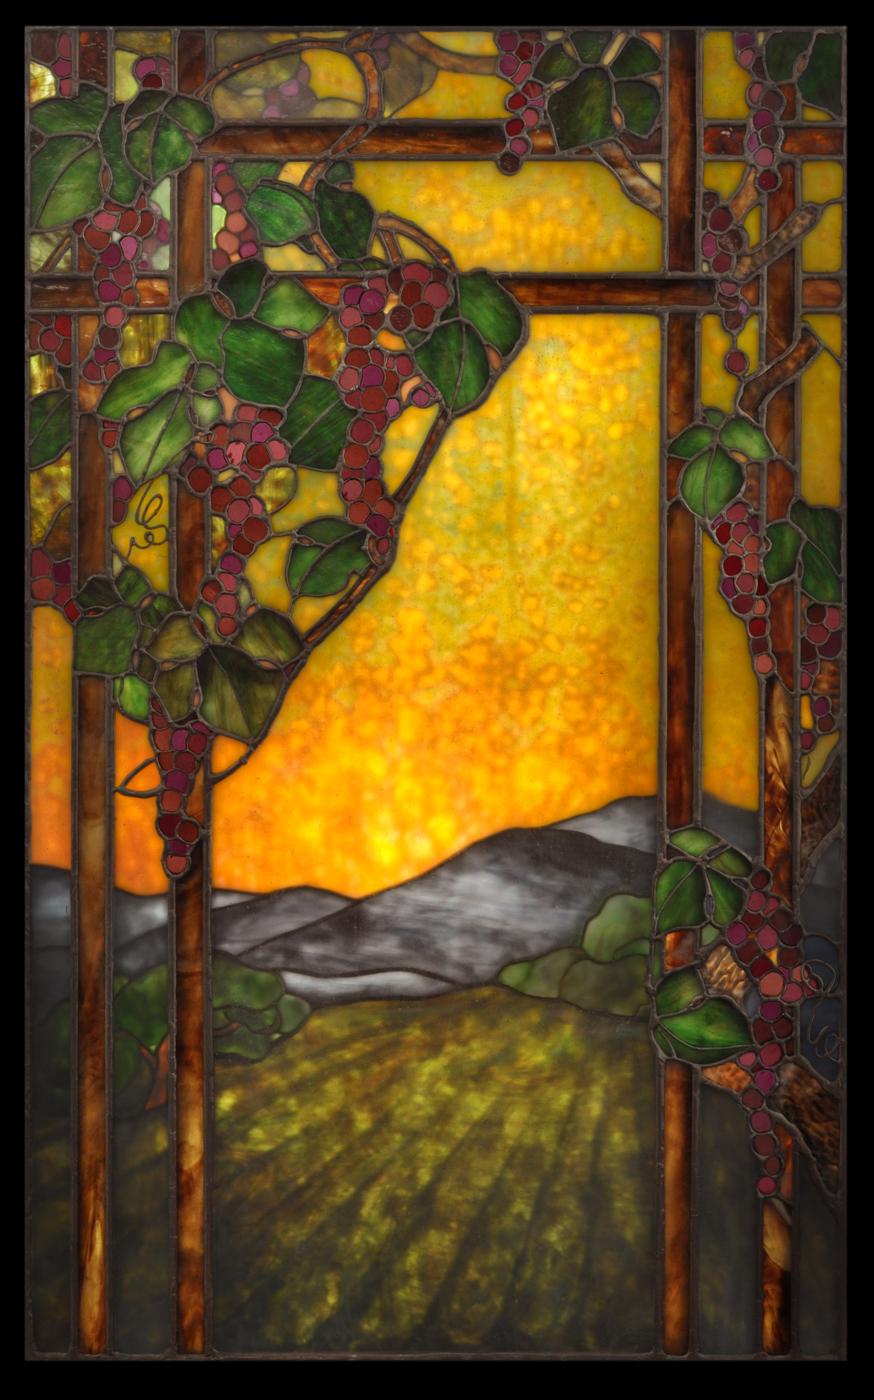 02_mcdonald_wine_cellar_landscape.jpg